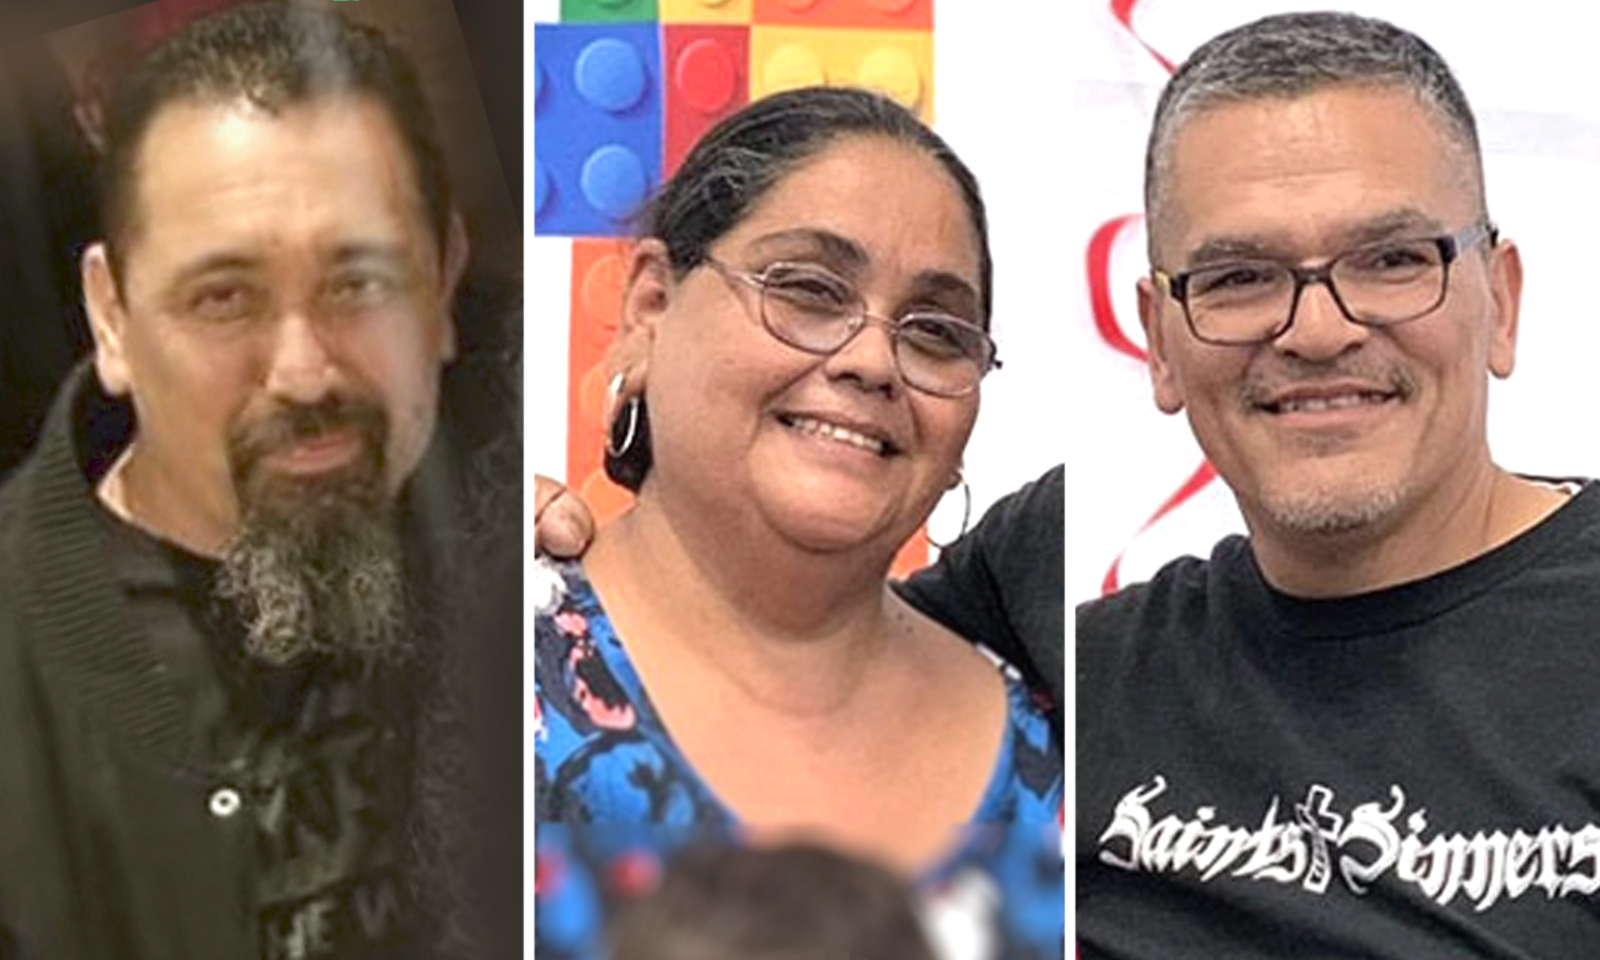 "Fabian ""Chino"" Levario, 52, died Dec. 10, followed by his sister Deborah Levario, 47 on Dec. 23 and her husband Armando Padilla, 49, on Dec. 29."